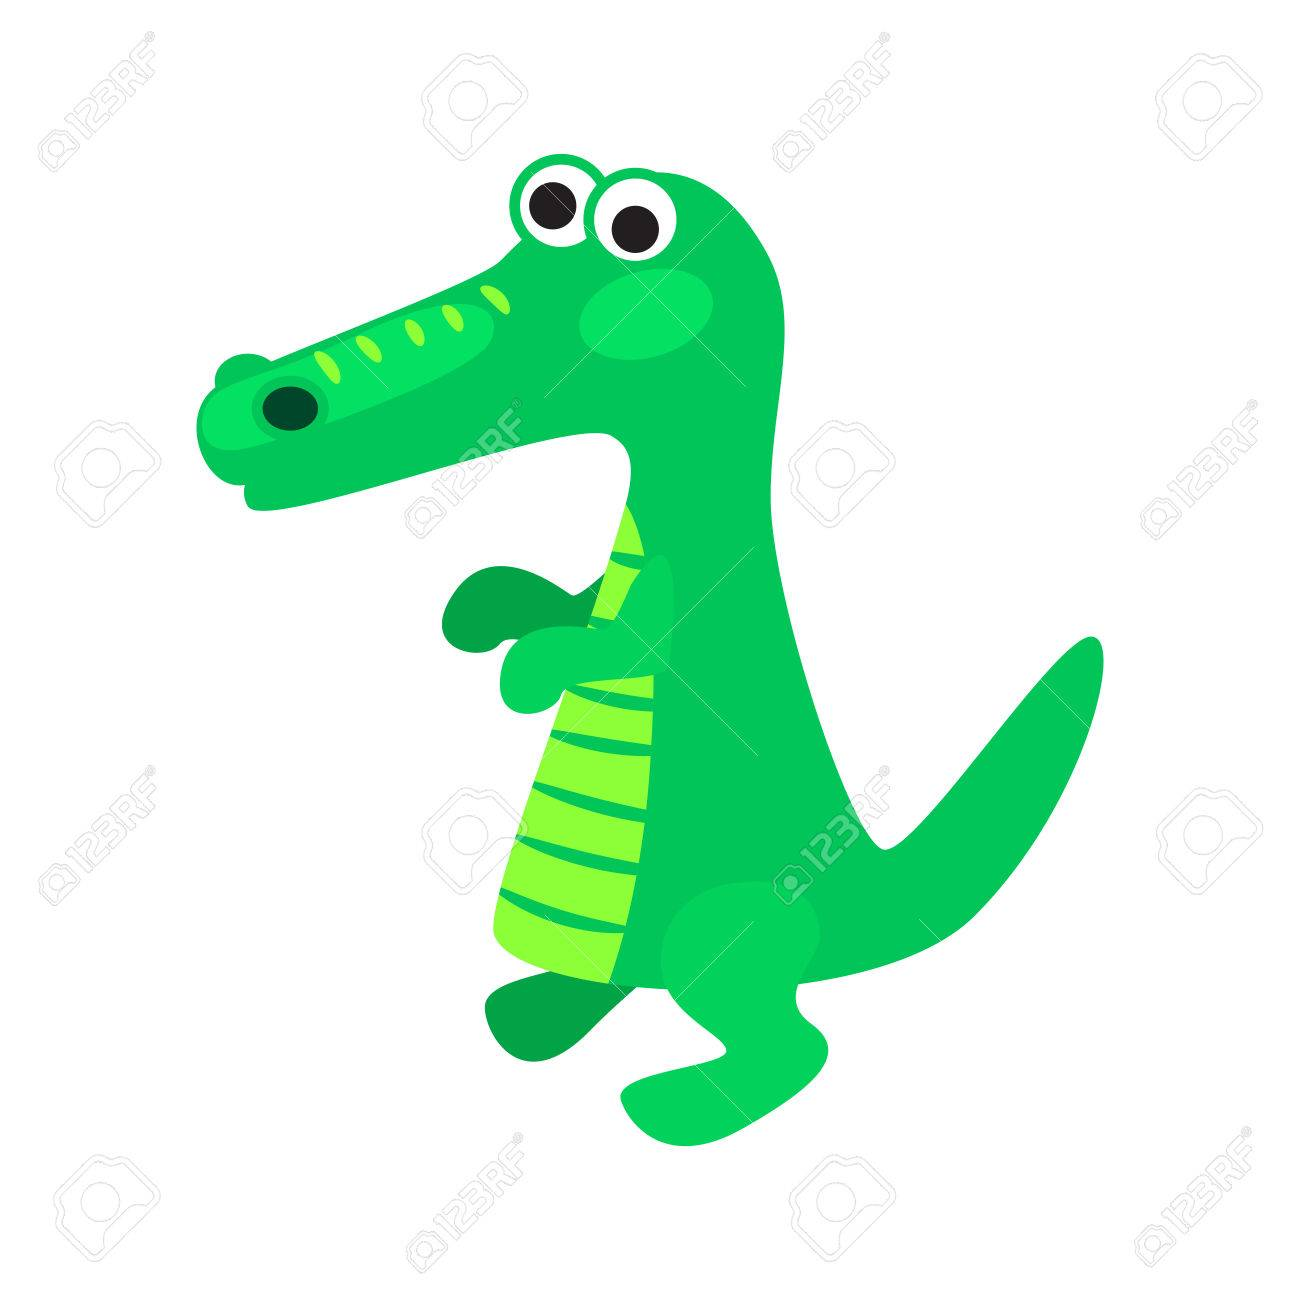 1300x1300 Cartoon Crocodile Vector Illustration. Green Kid Alligator